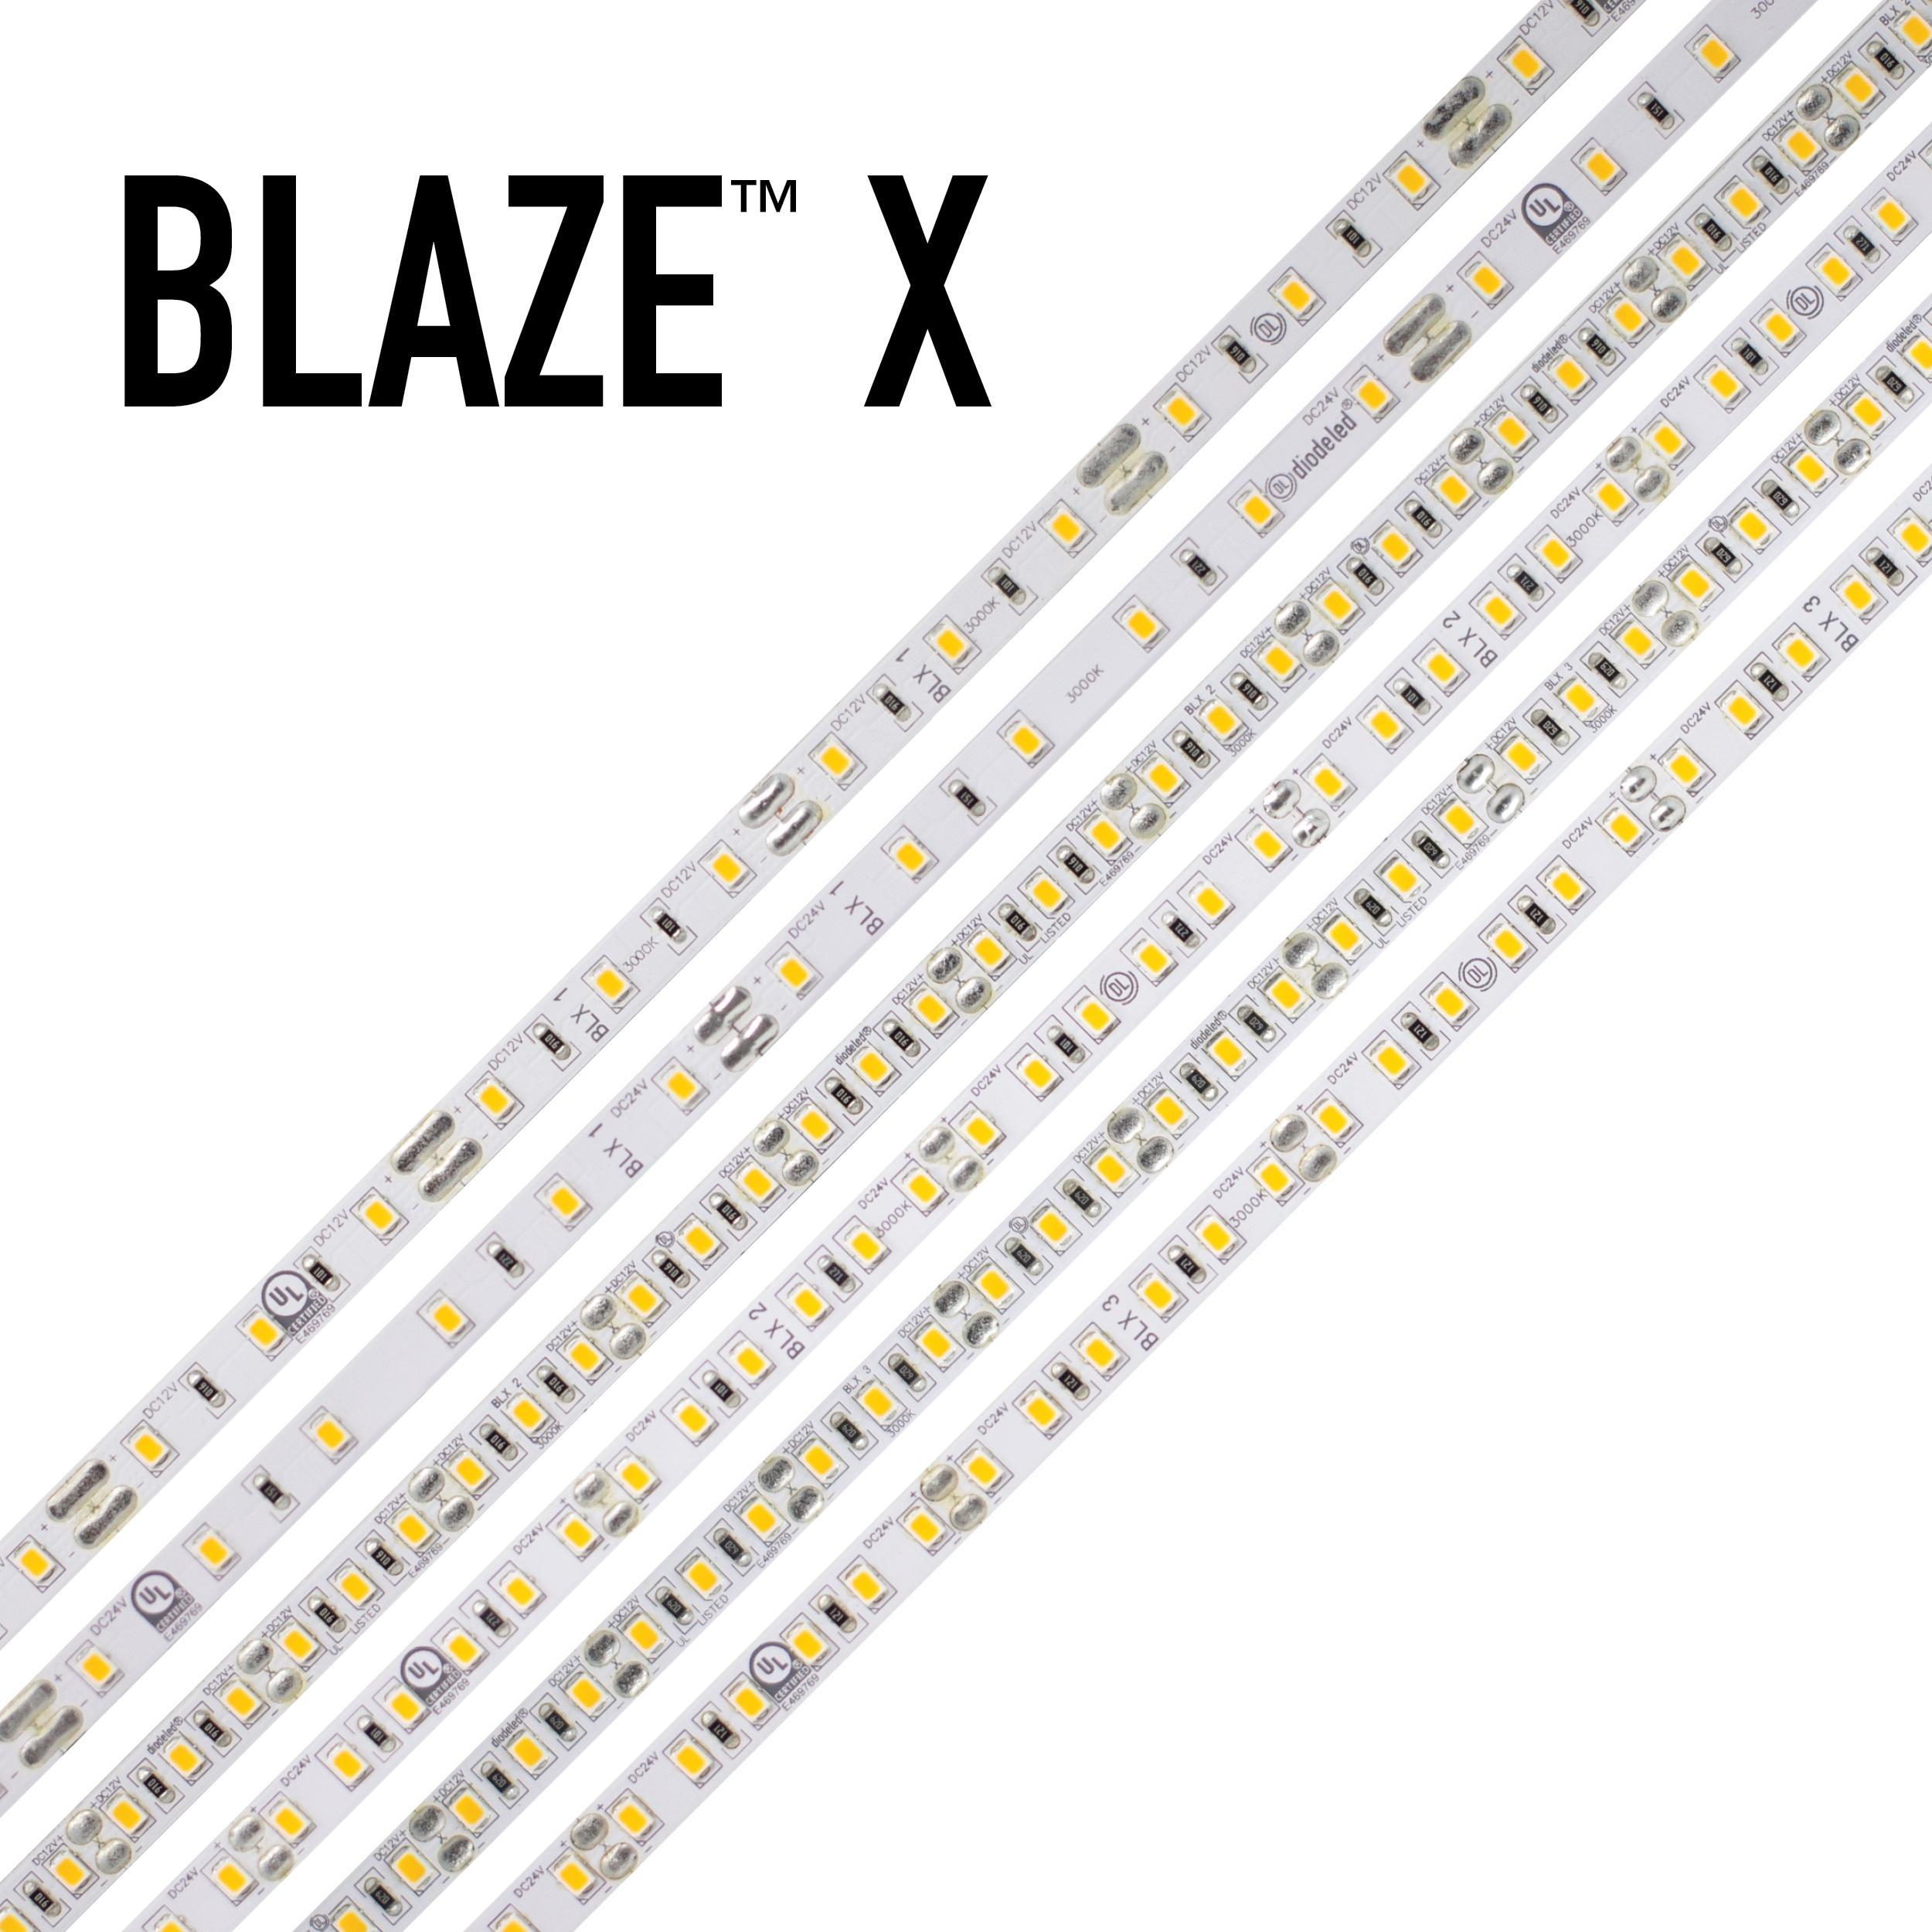 BLAZE™ X LED Tape Light